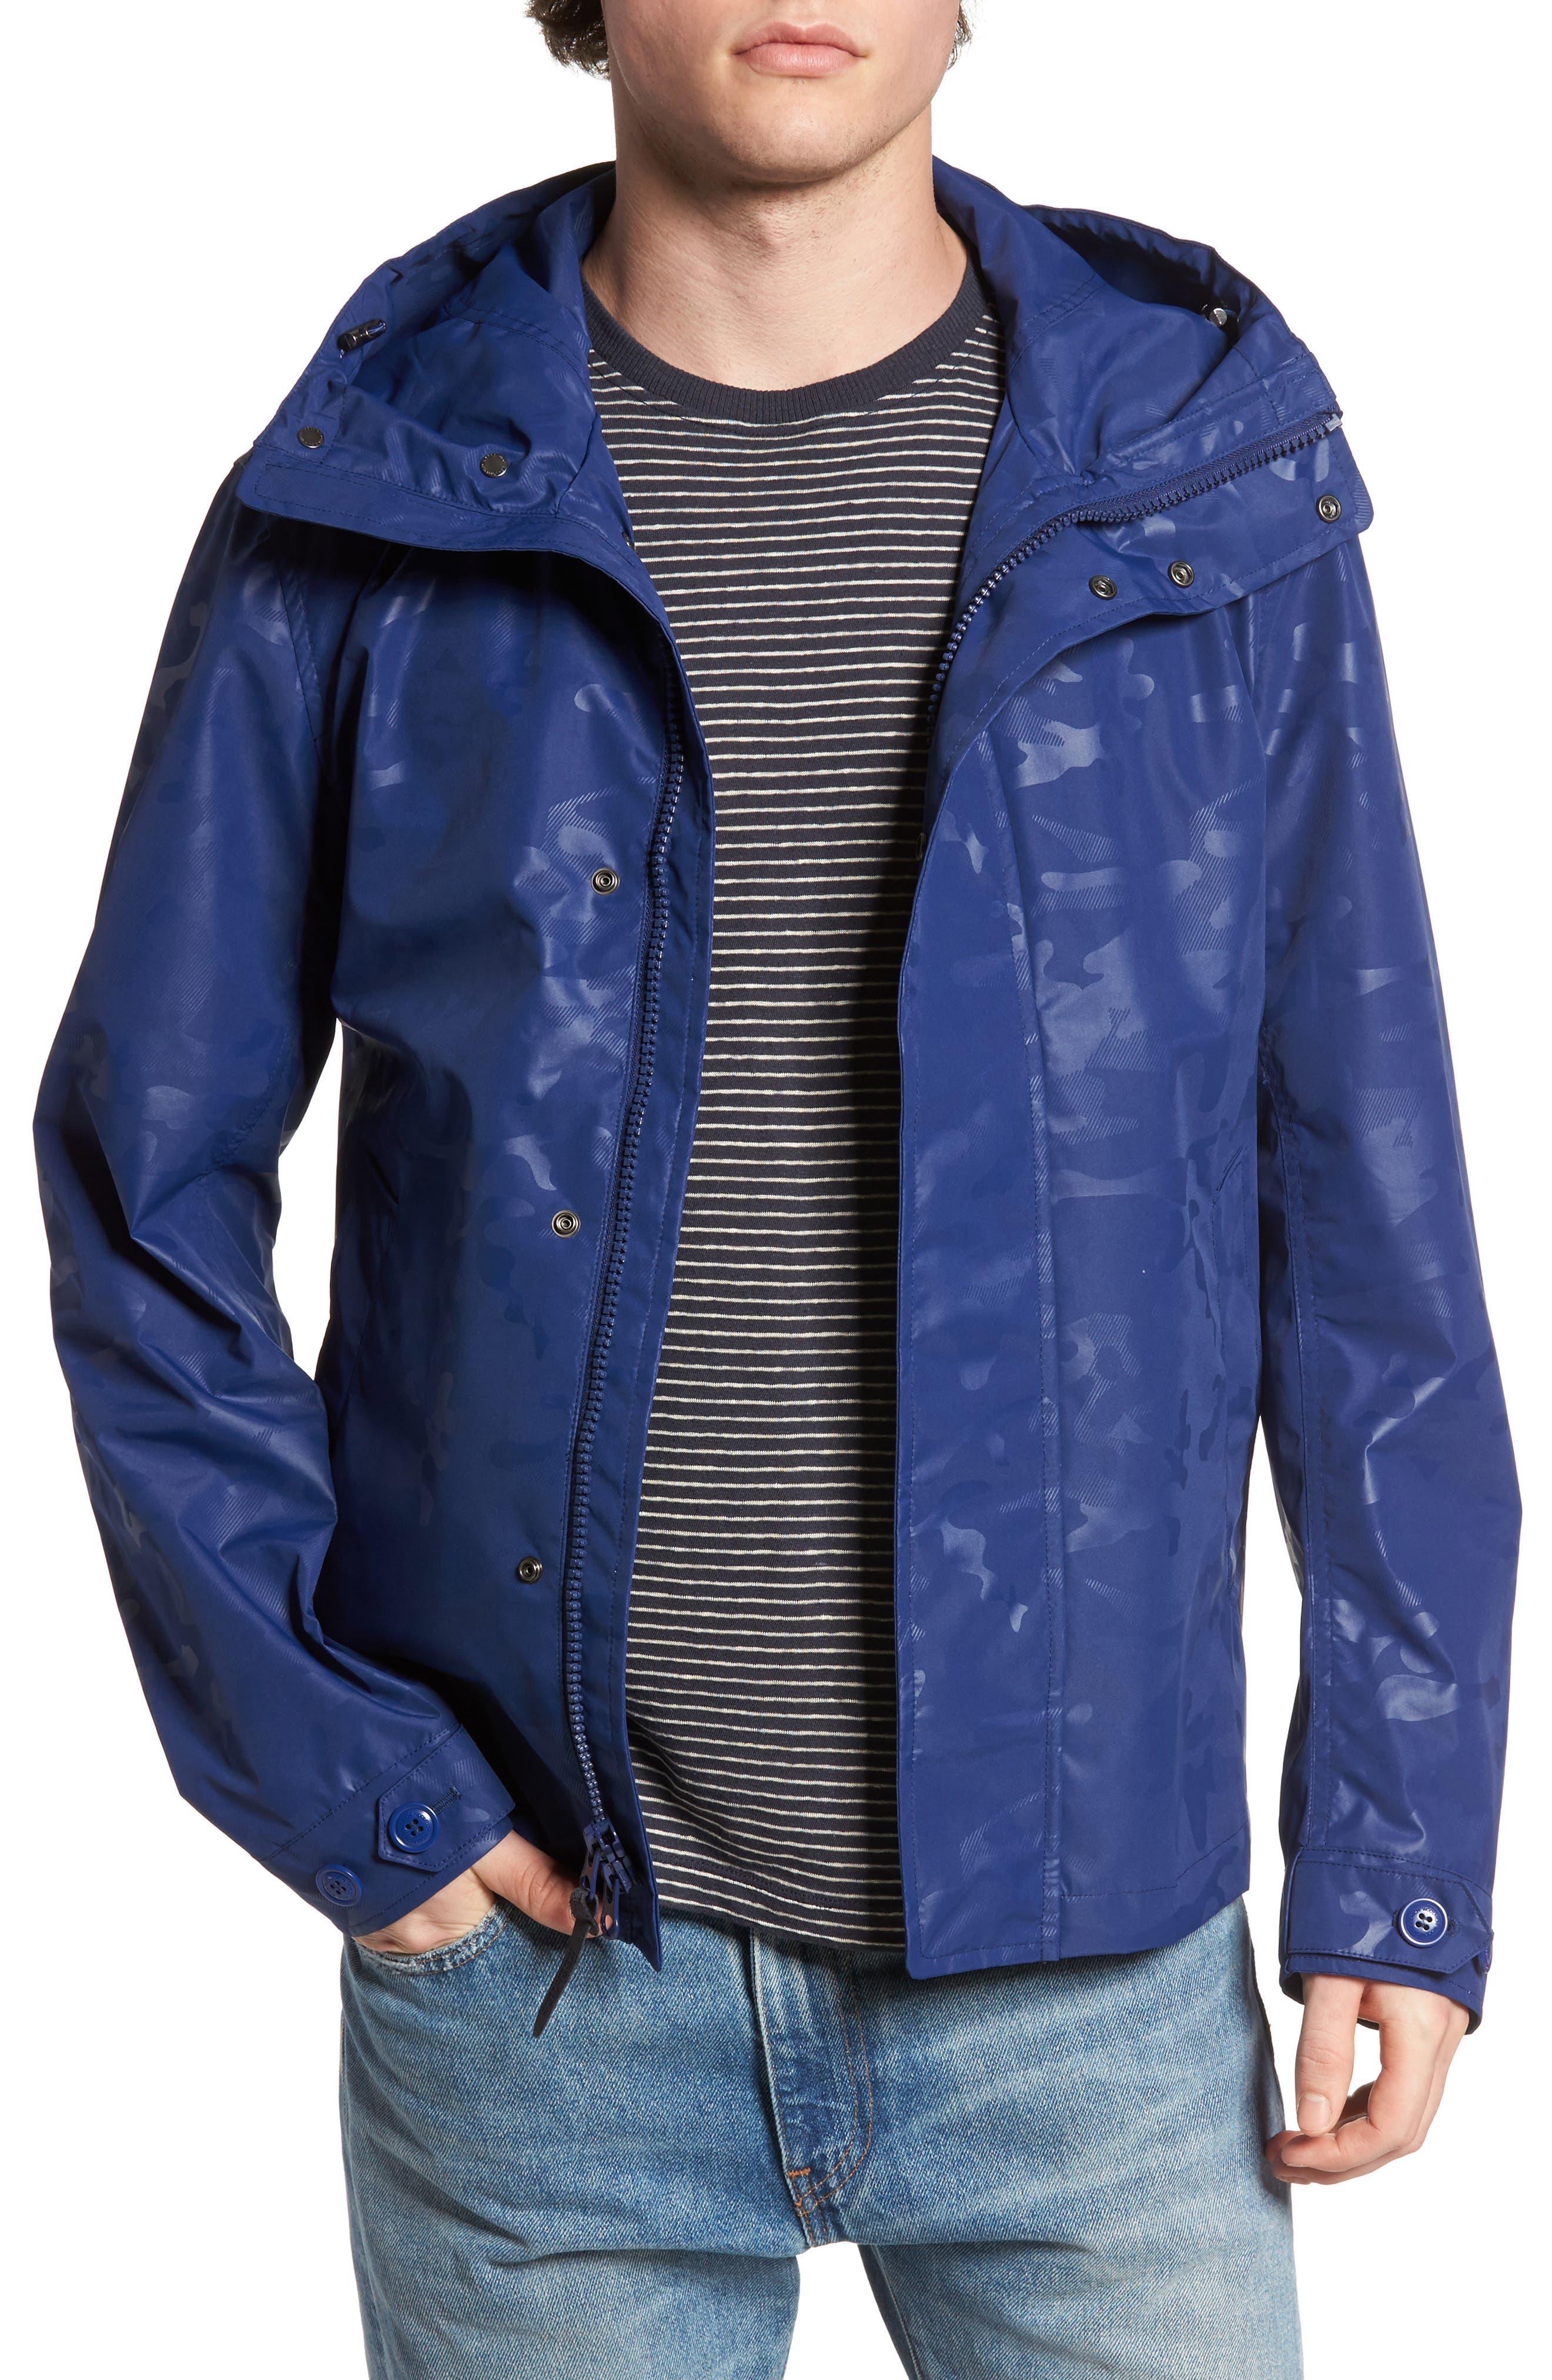 Camou Rudder Waterproof Jacket,                             Main thumbnail 1, color,                             Twilight Blue